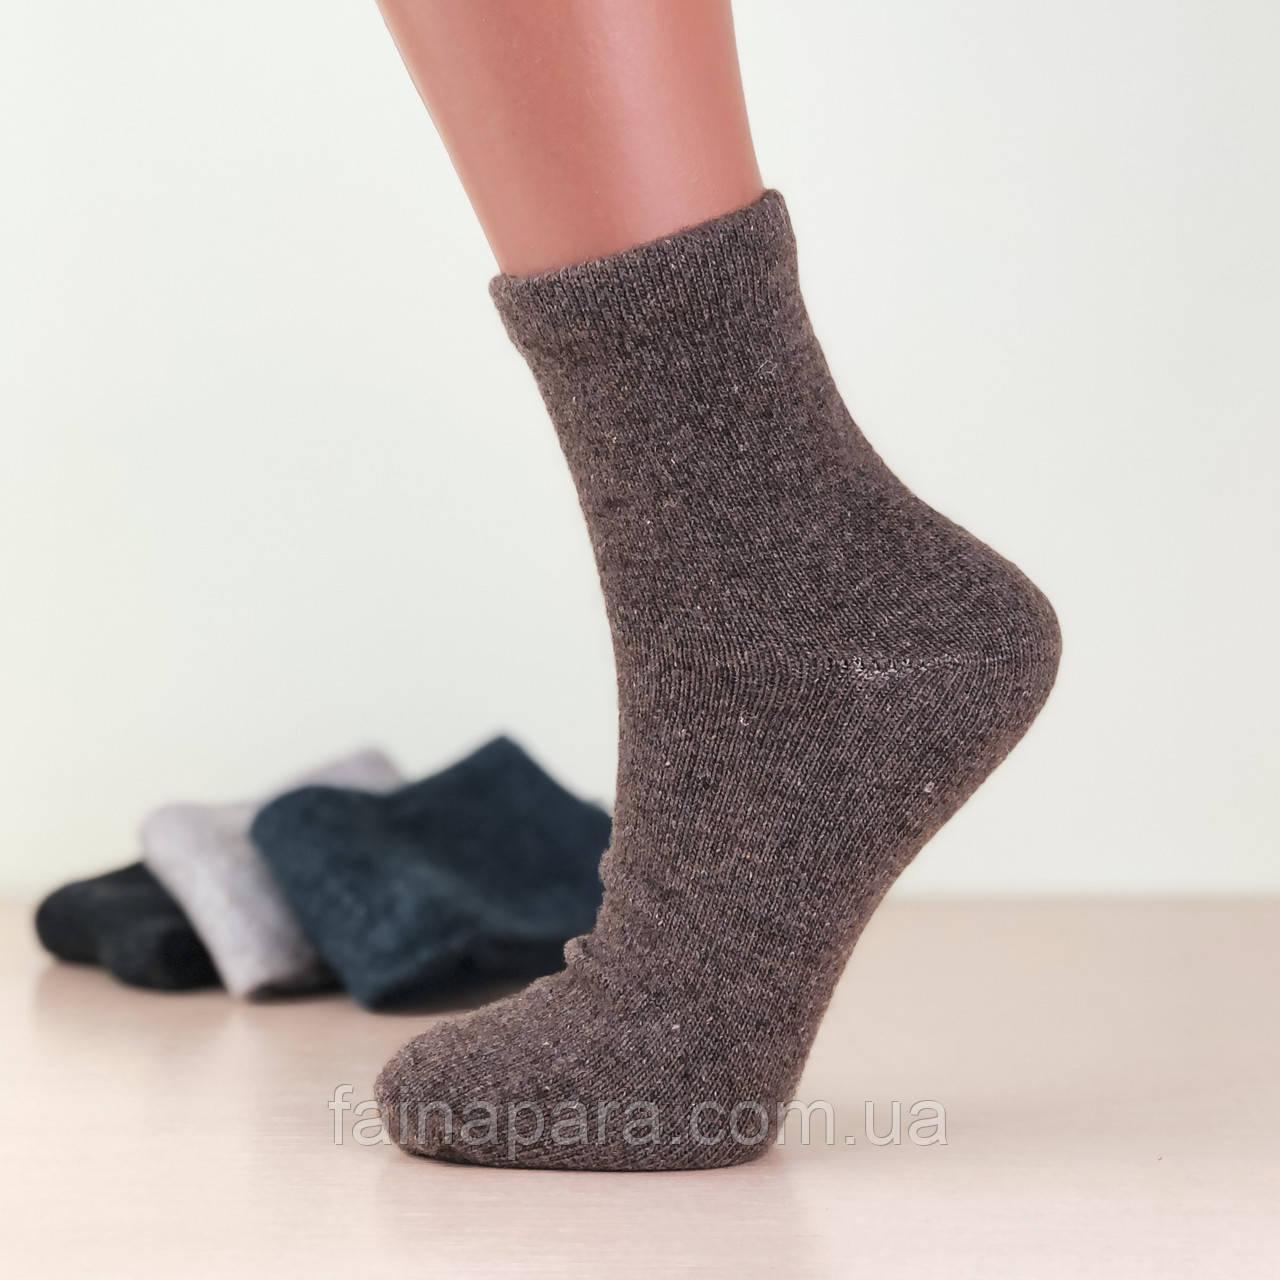 Женские шерстяные однотонные термо носки Style Luxe